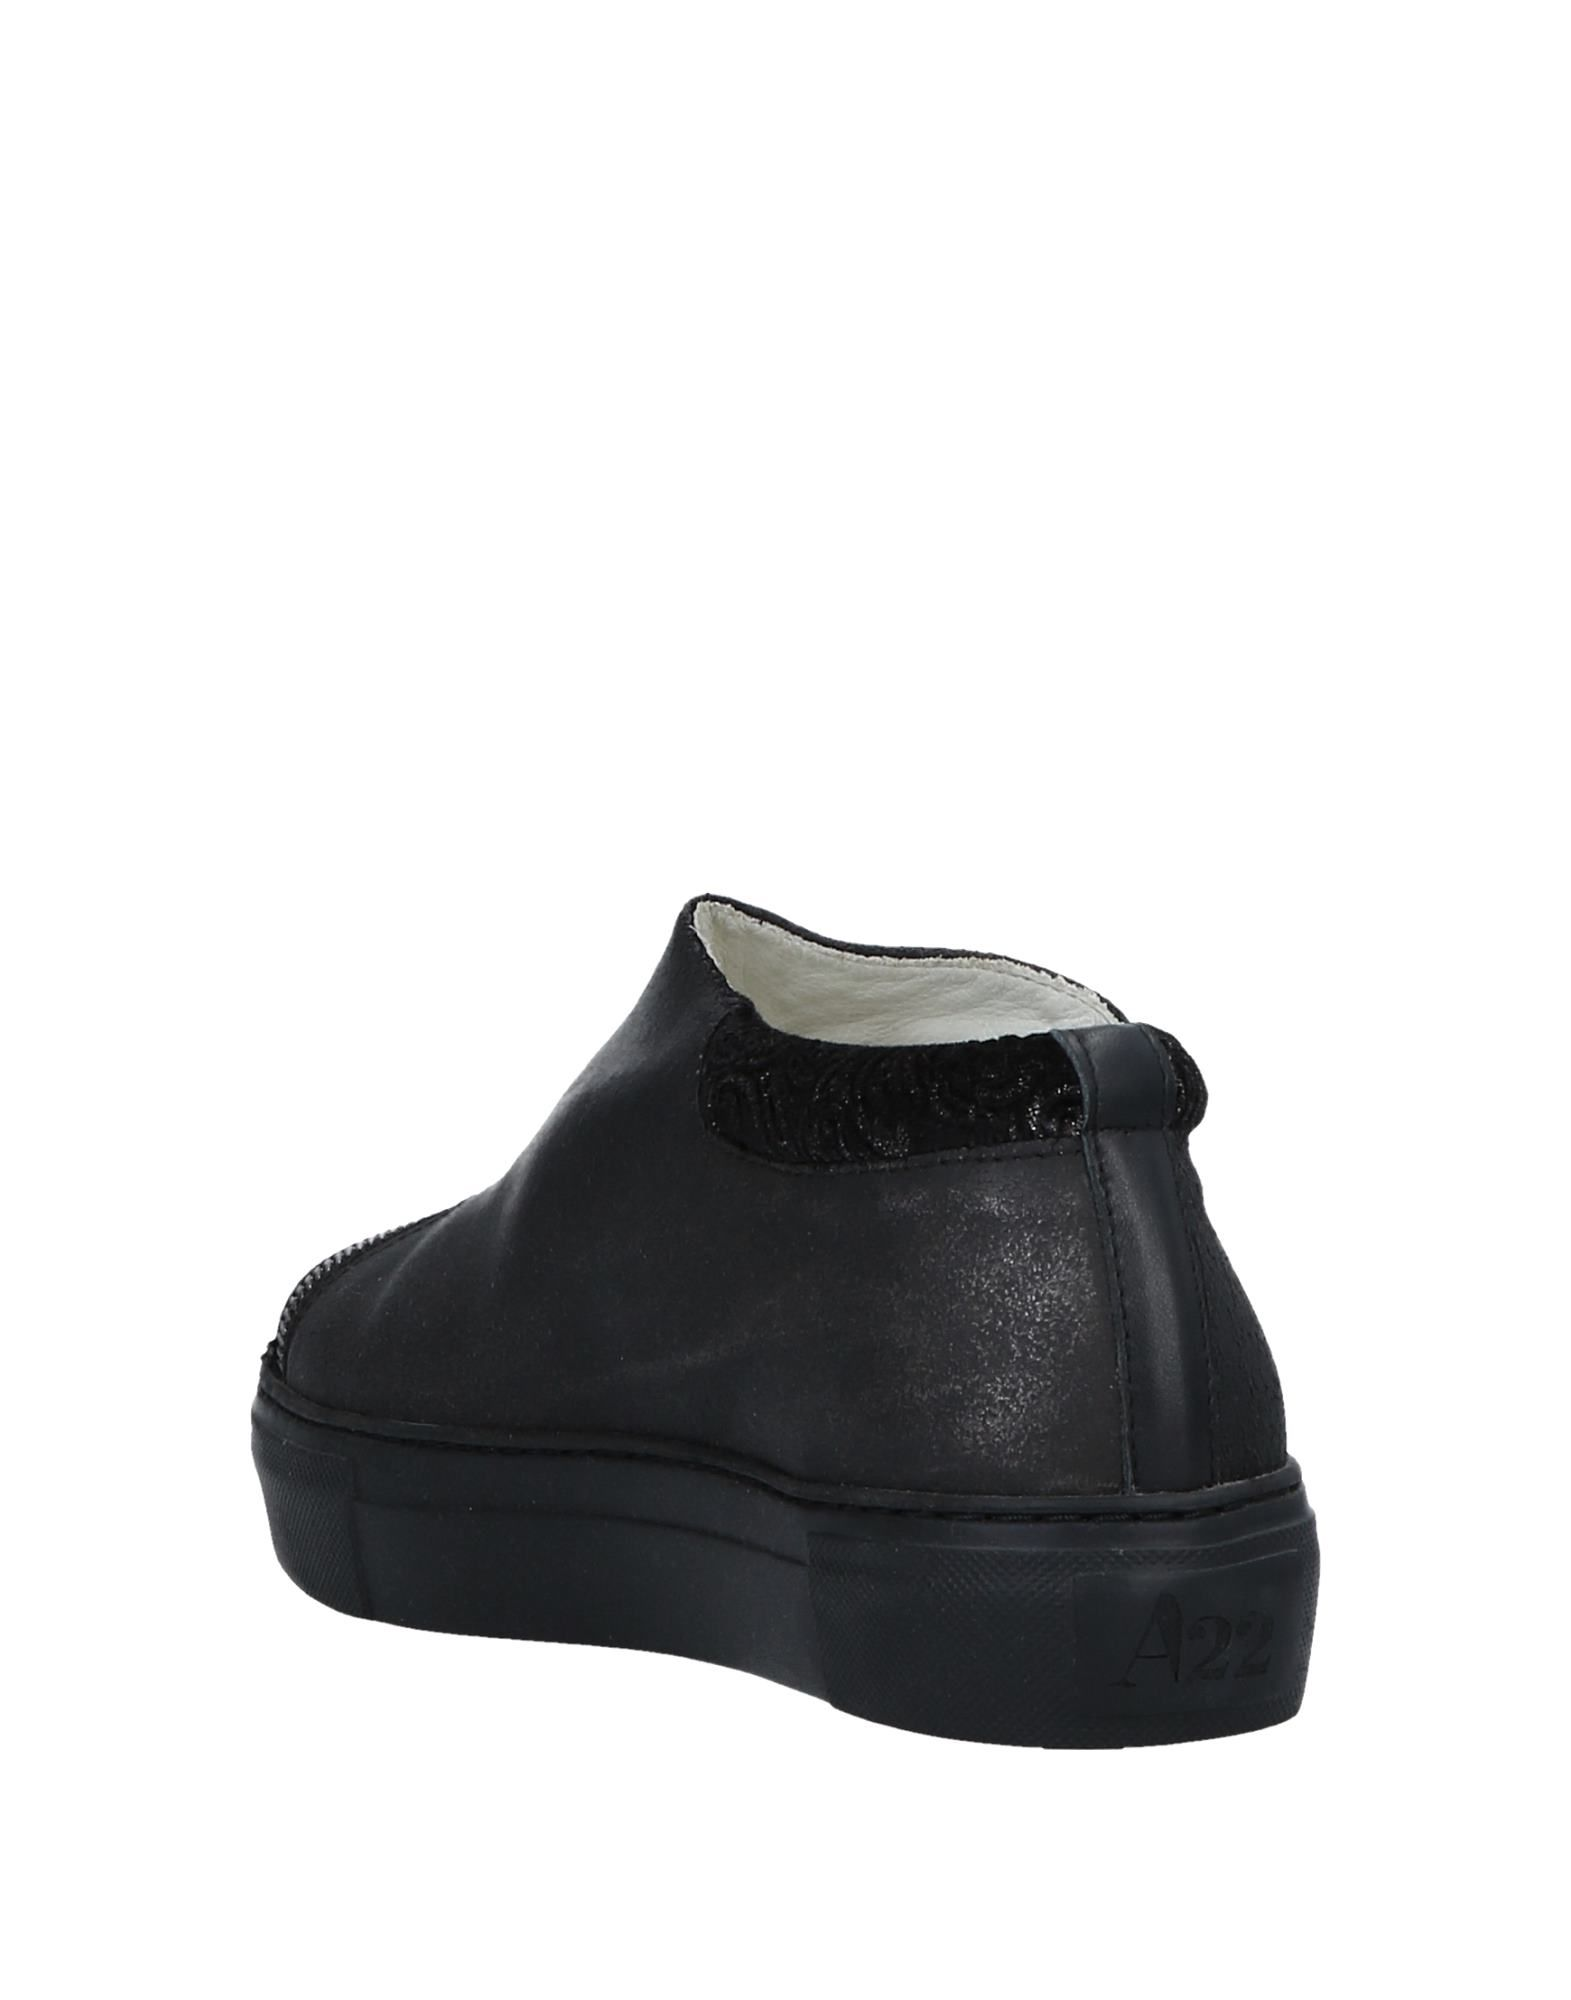 Archivio,22 Gute Sneakers Damen  11499939UU Gute Archivio,22 Qualität beliebte Schuhe 0dde64